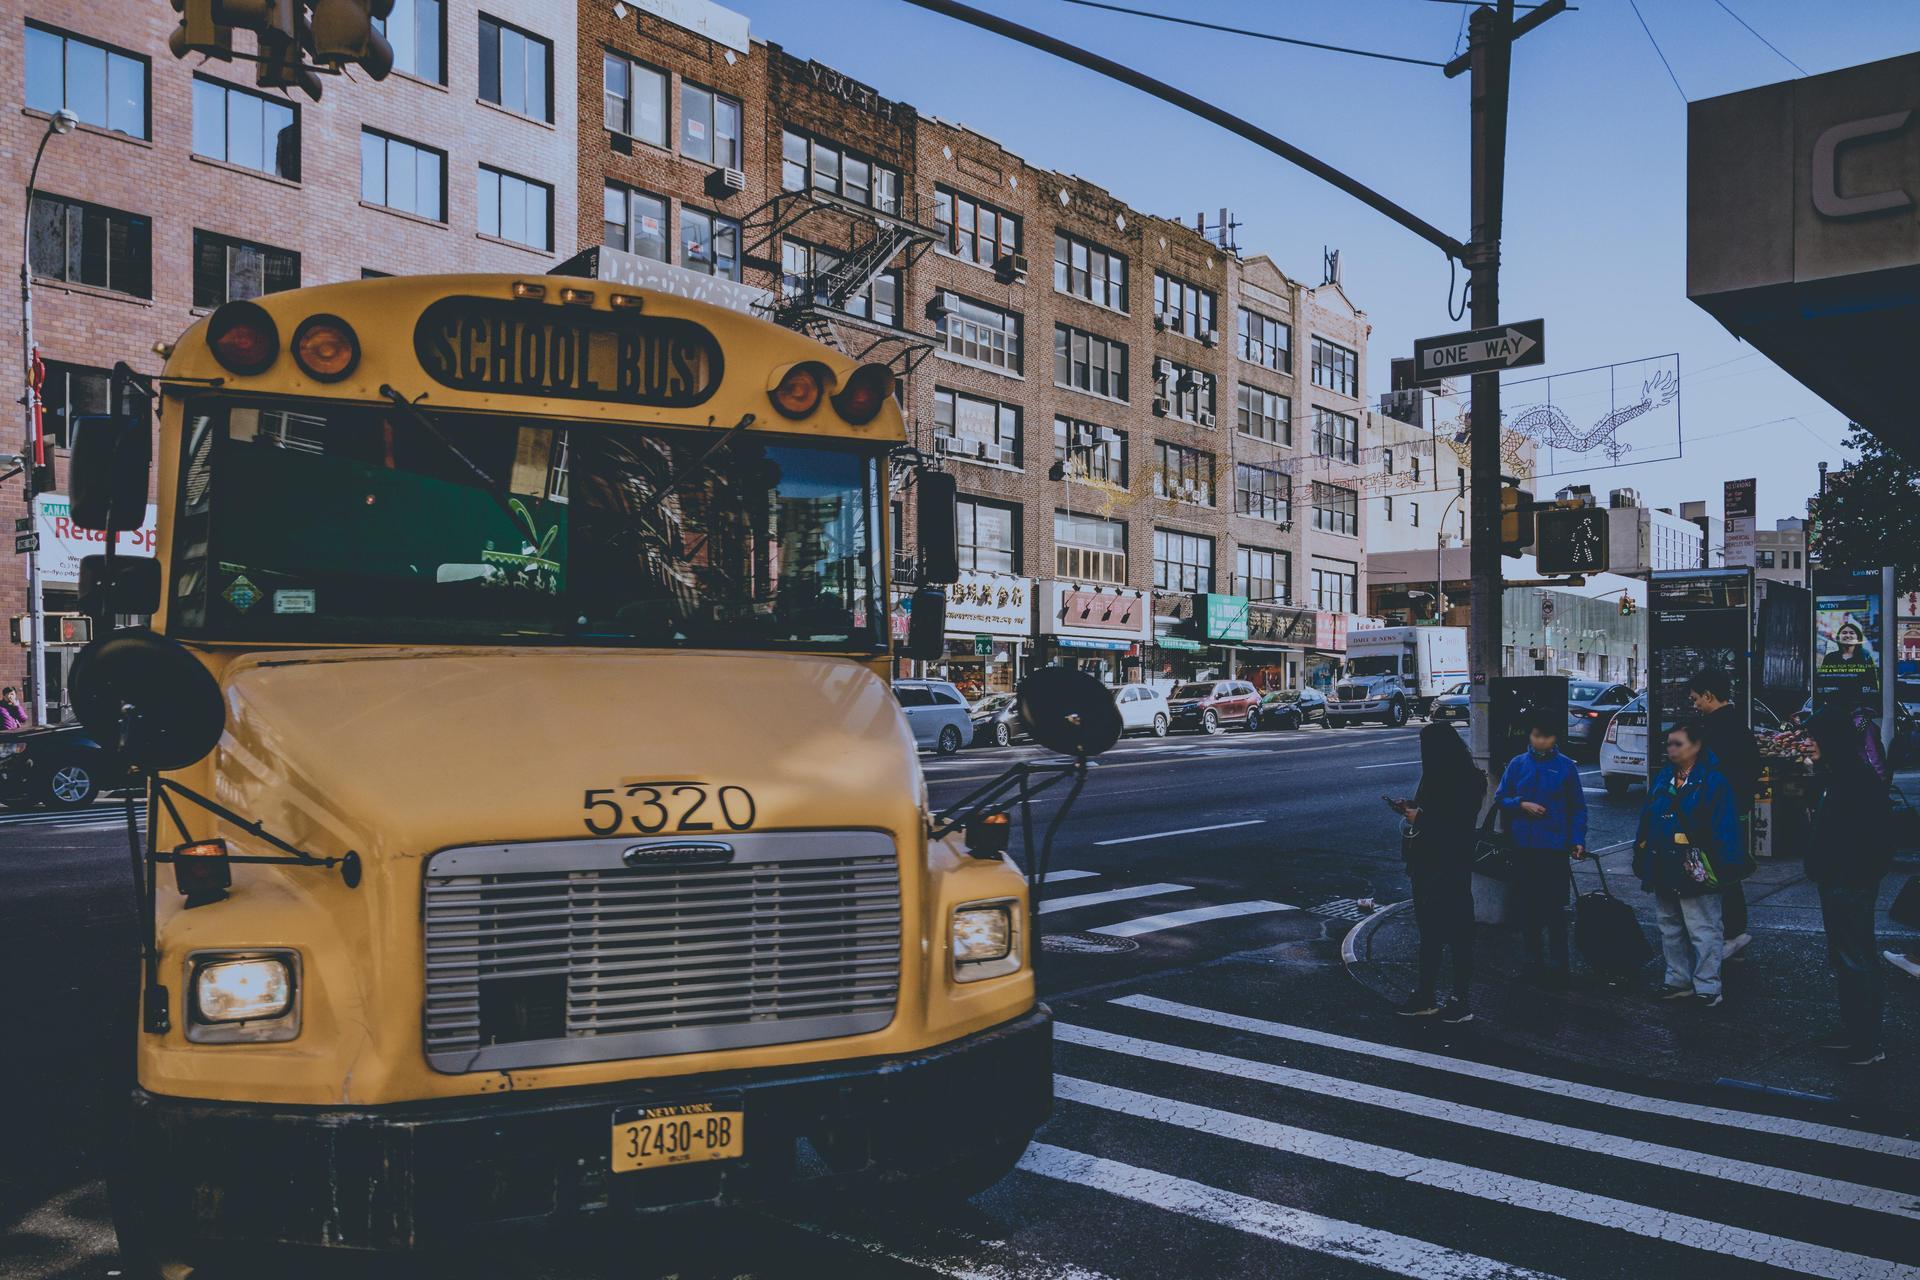 yellow school bus on urban street